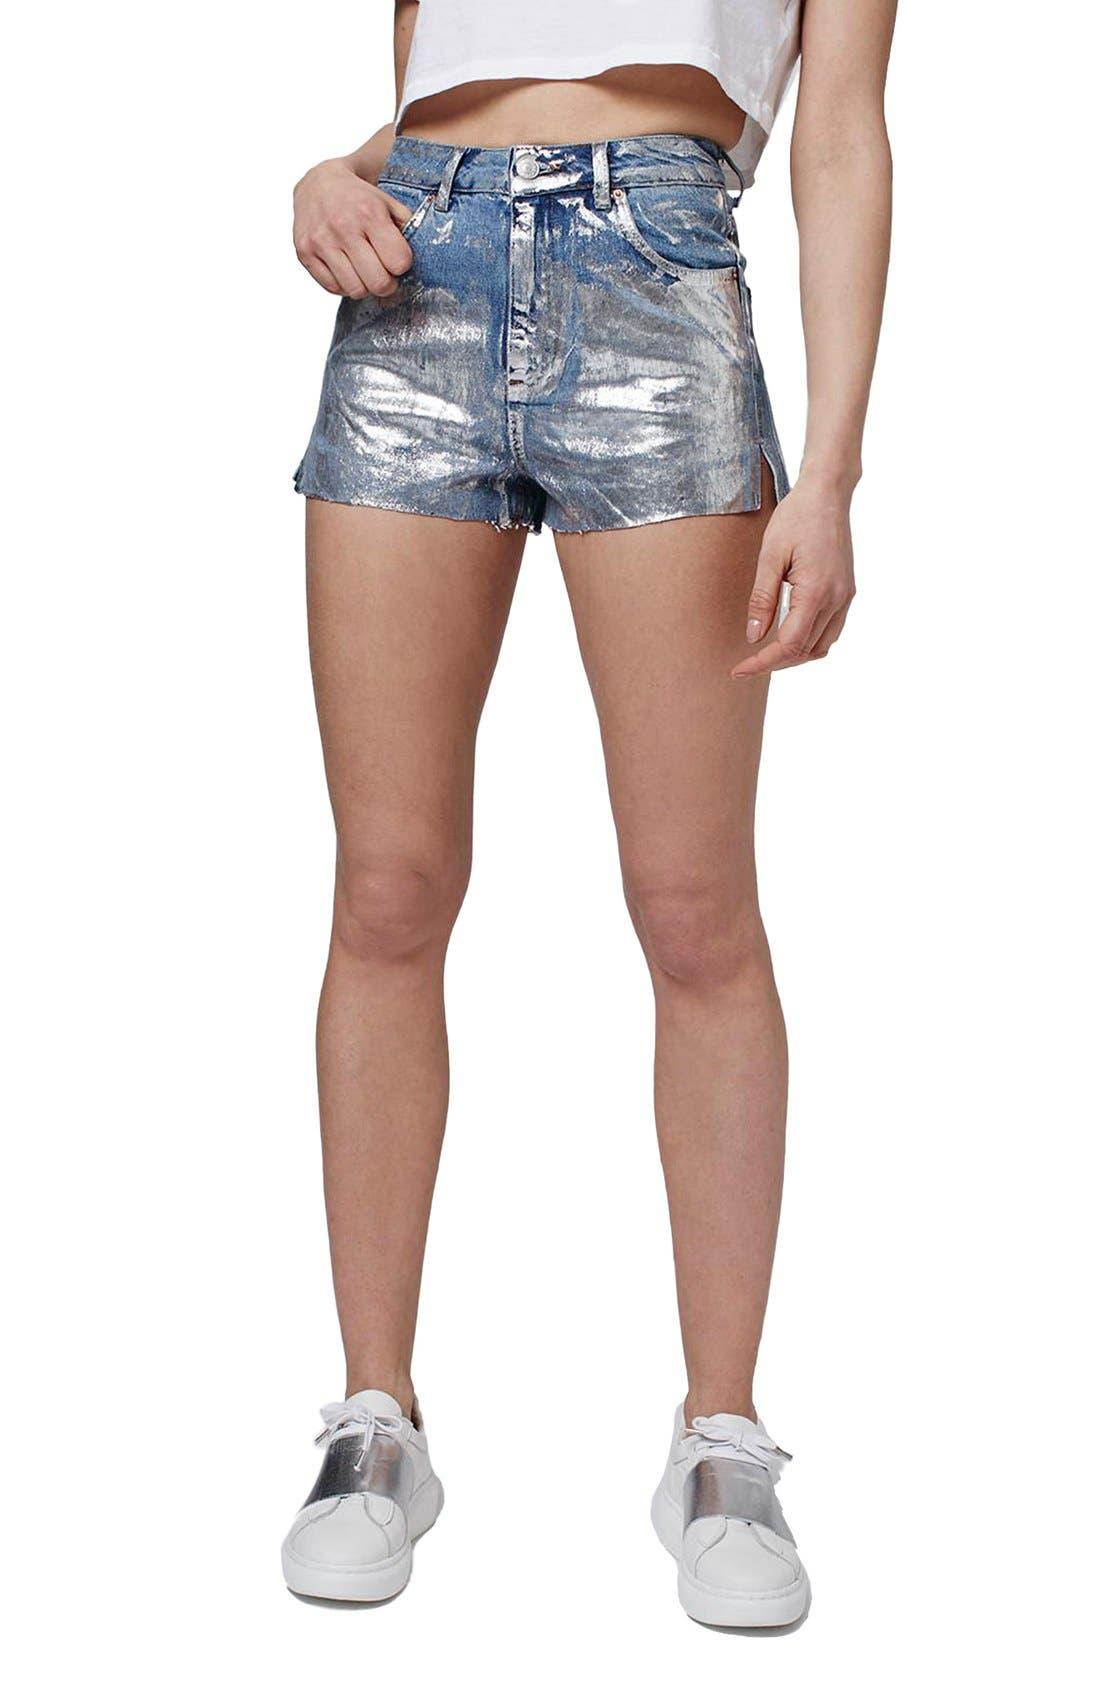 Alternate Image 1 Selected - Topshop Moto Metallic Paint Cutoff Mom Shorts